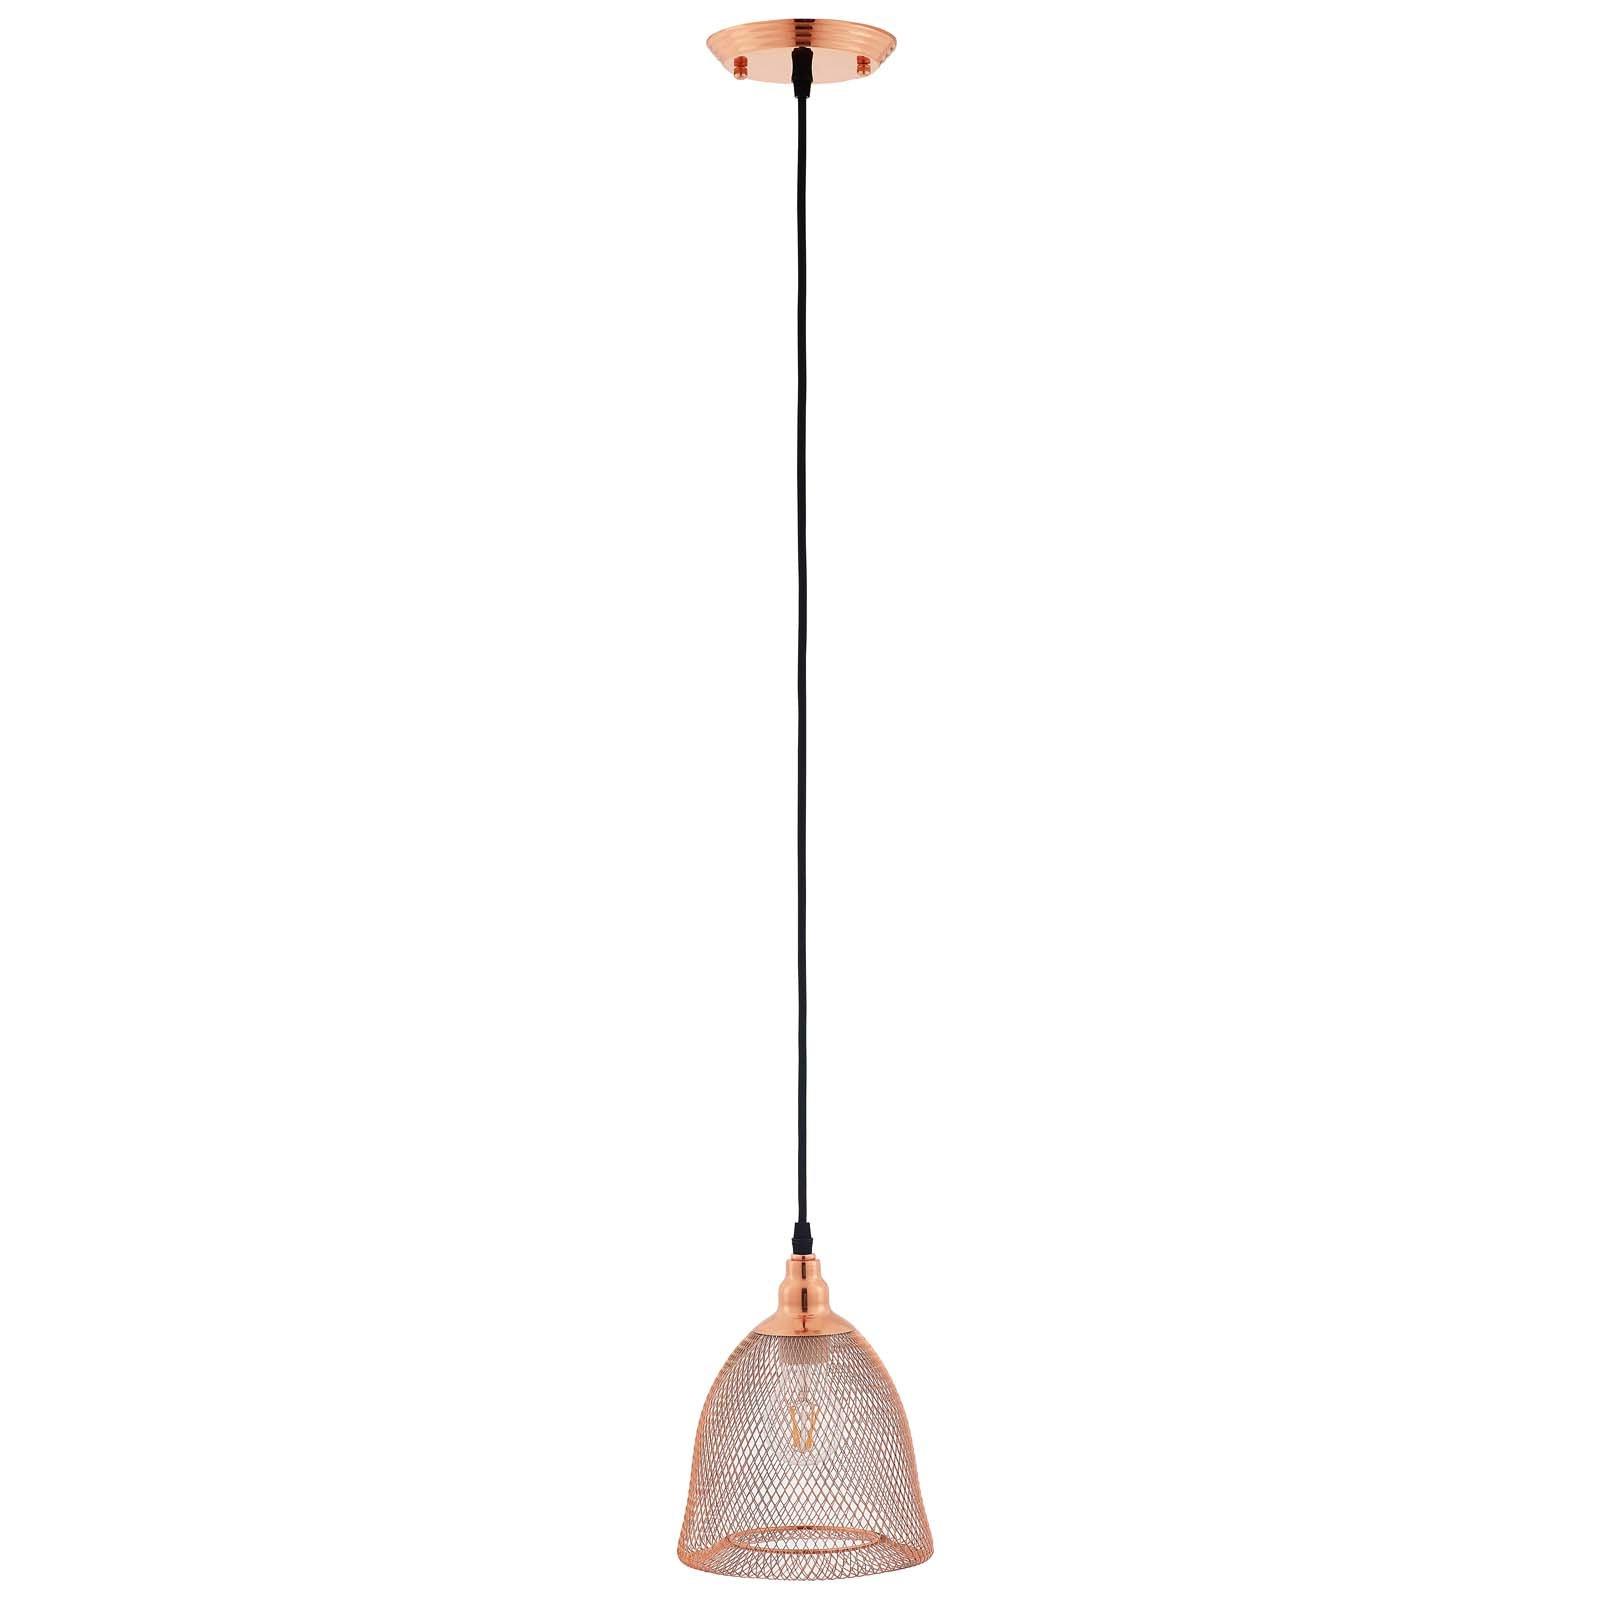 Oldbury 1 Light Single Cylinder Pendants Within Popular Buntingford Glimmer 1 Light Single Bell Pendant (Gallery 10 of 20)